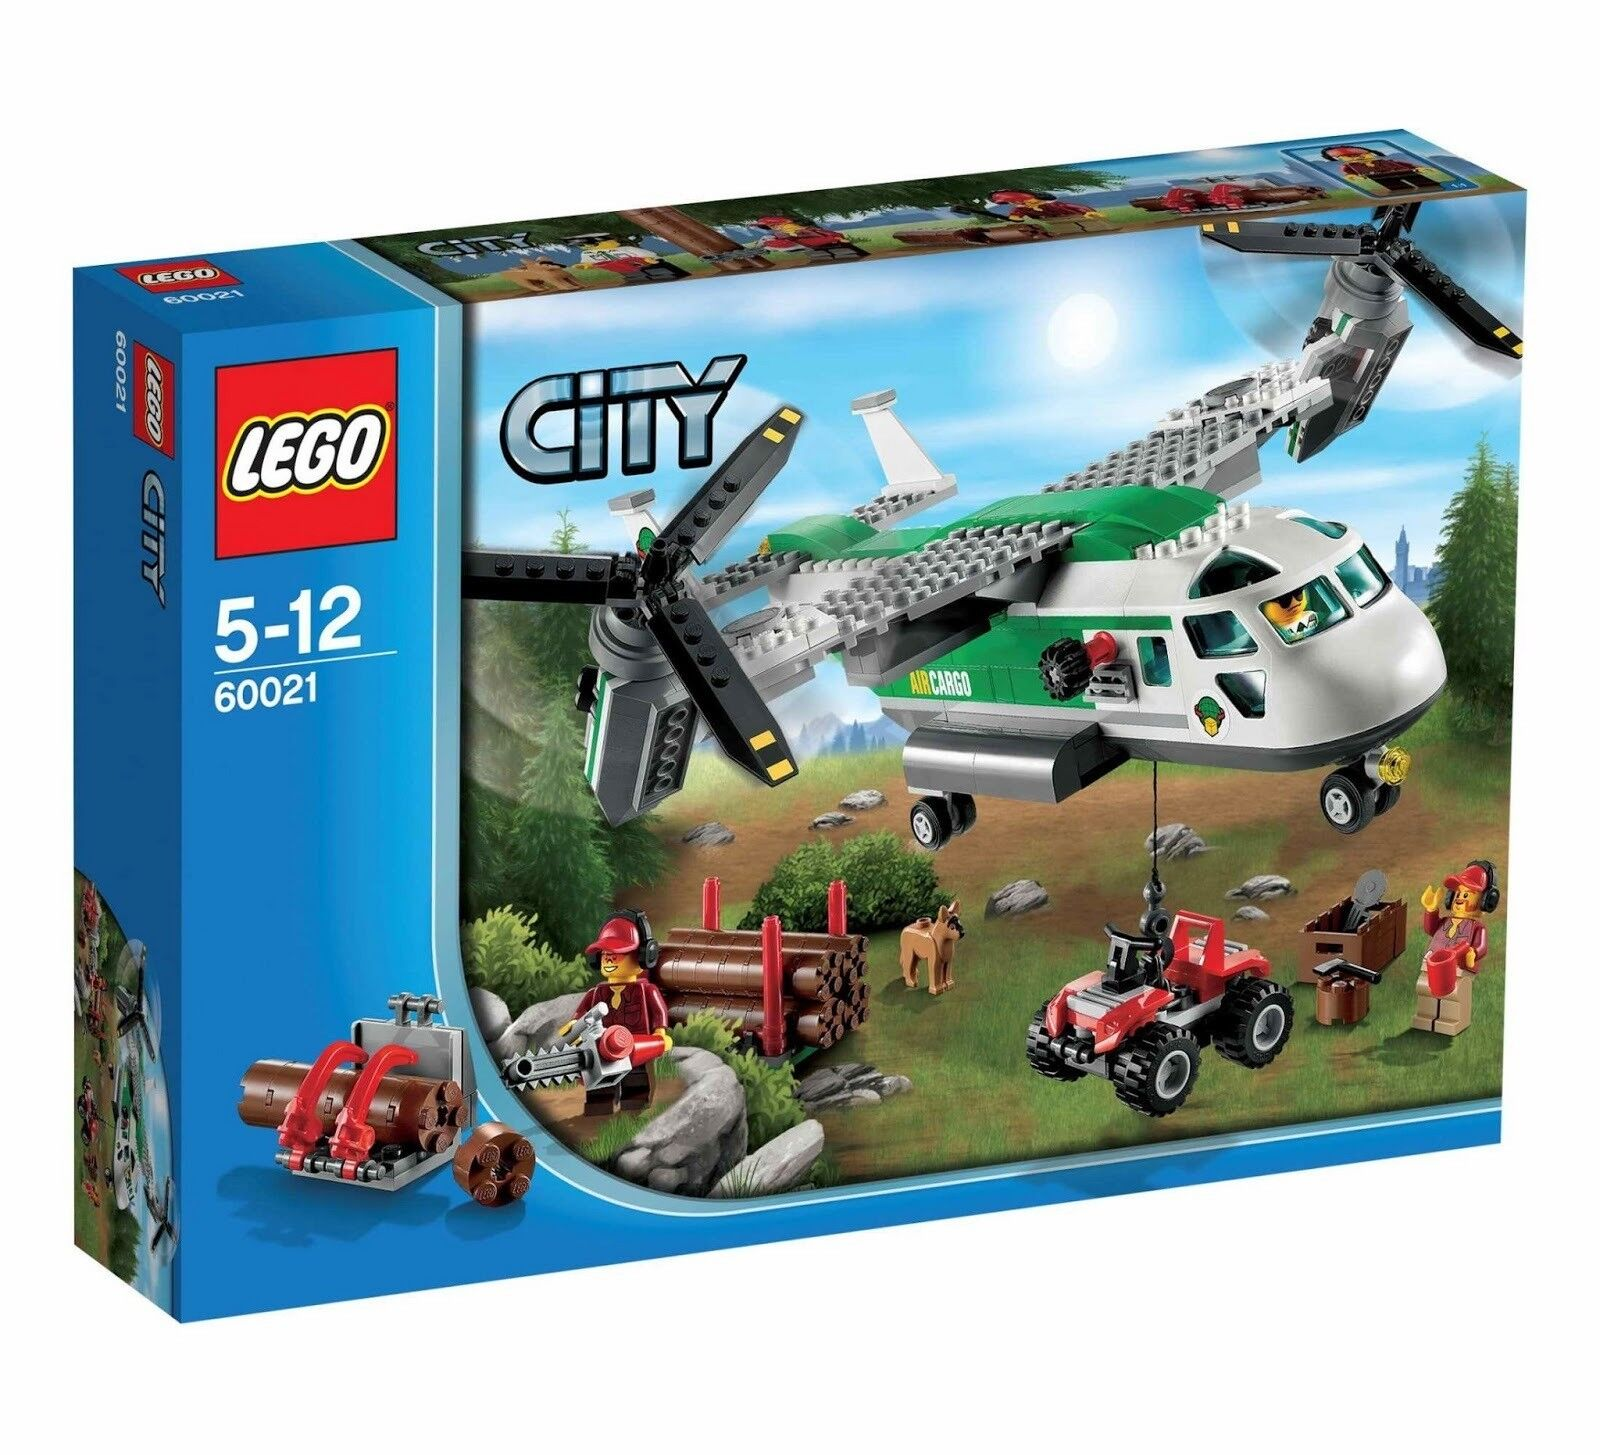 Lego City Ciudad 60021 Cargo Heliplane Perro Lumberjack Motosierra Quad Bicicleta NISB